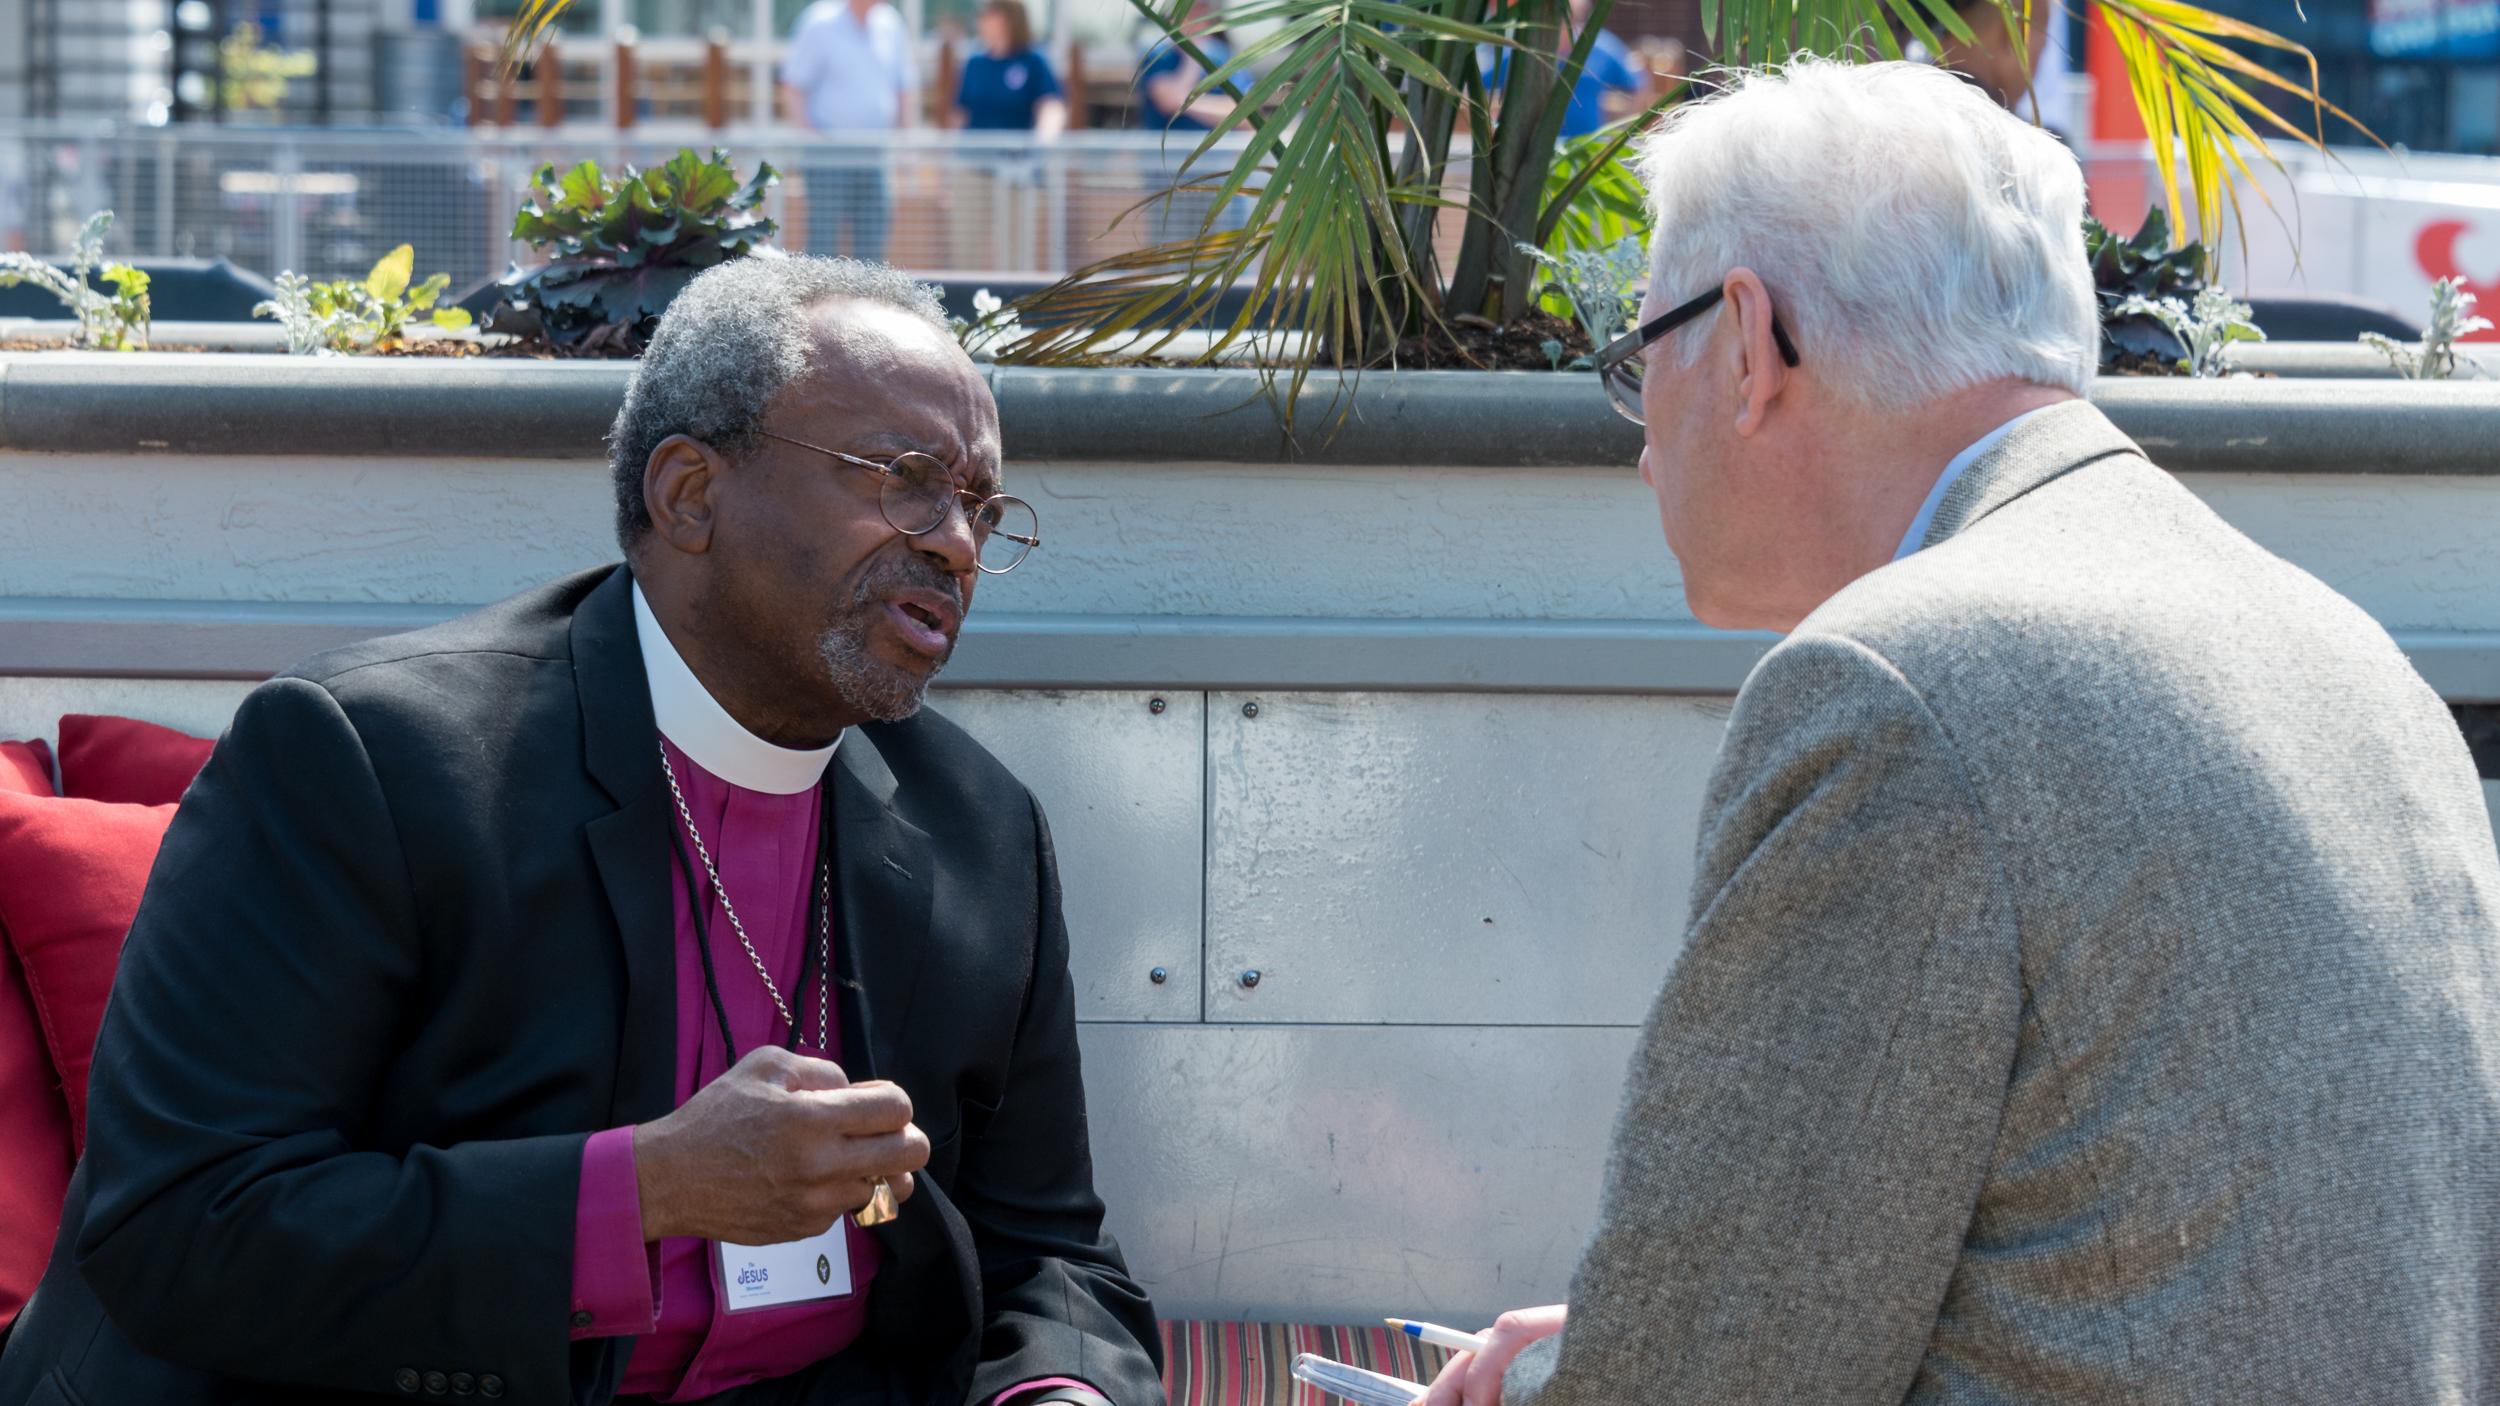 A Bishop Promotes a Renewed Jesus Movement